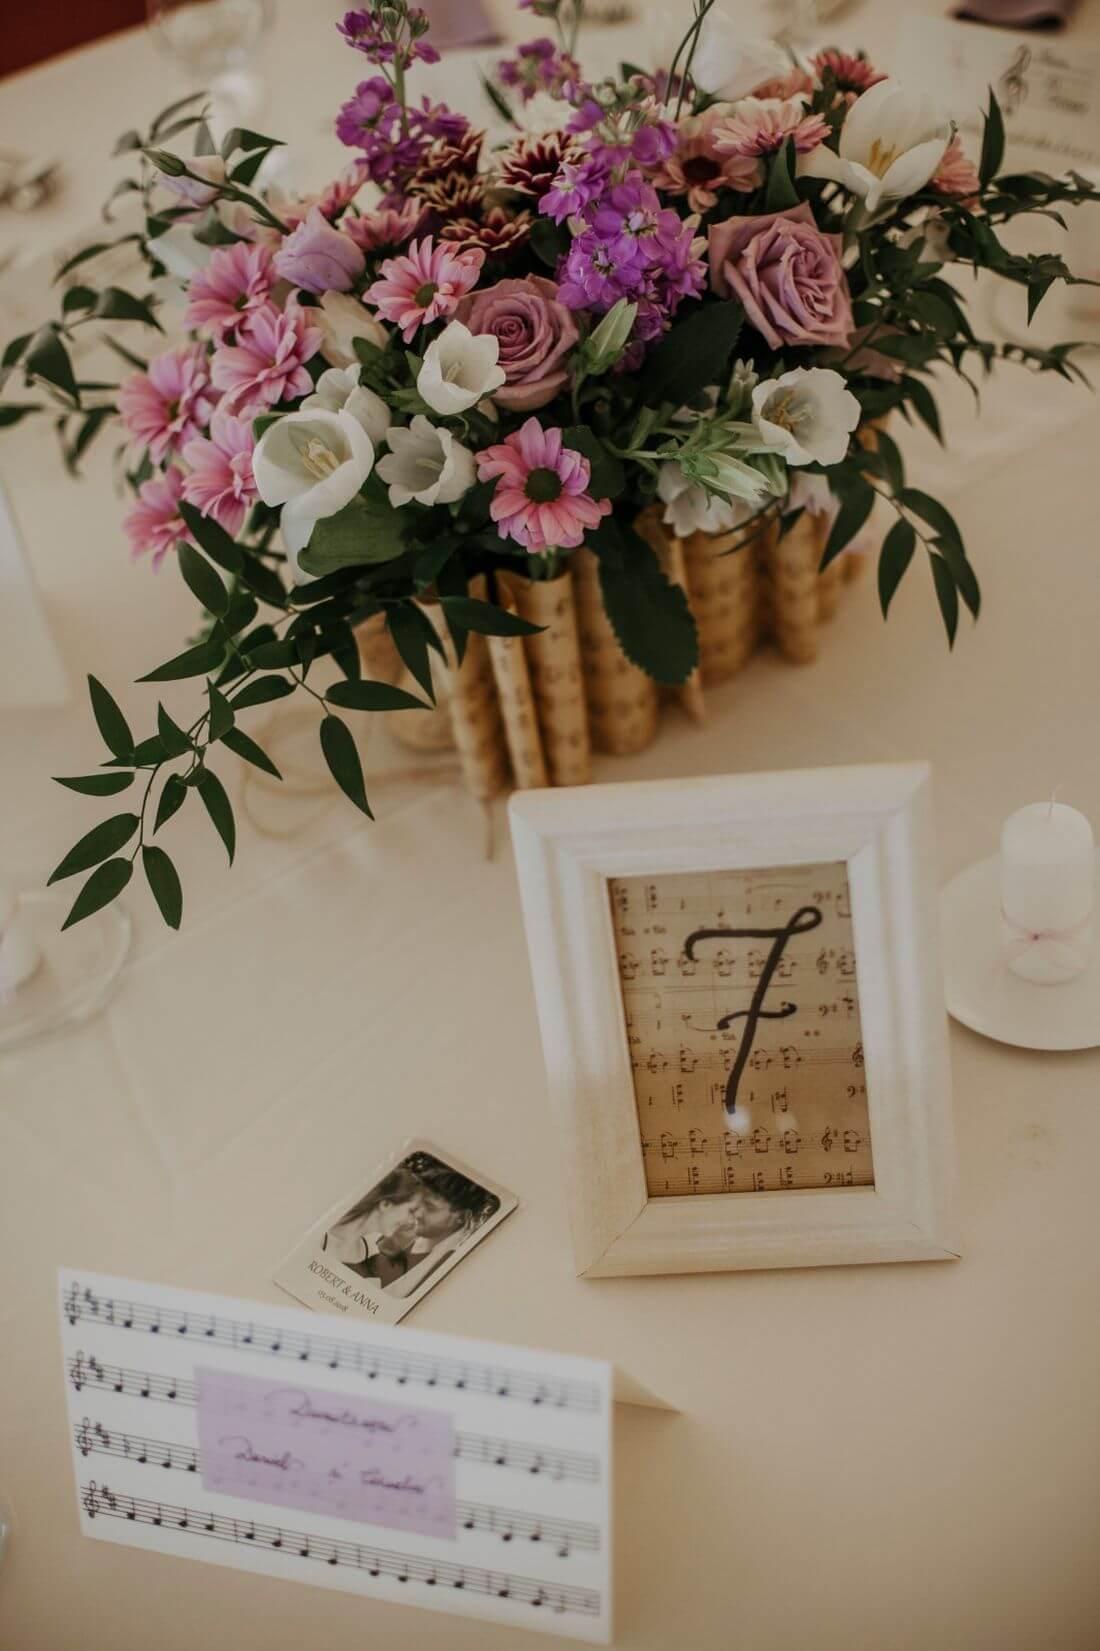 Nunta pe note muzicale – Ana-Maria si Robert – IDO-Weddings-nuntiinaerliber (20)